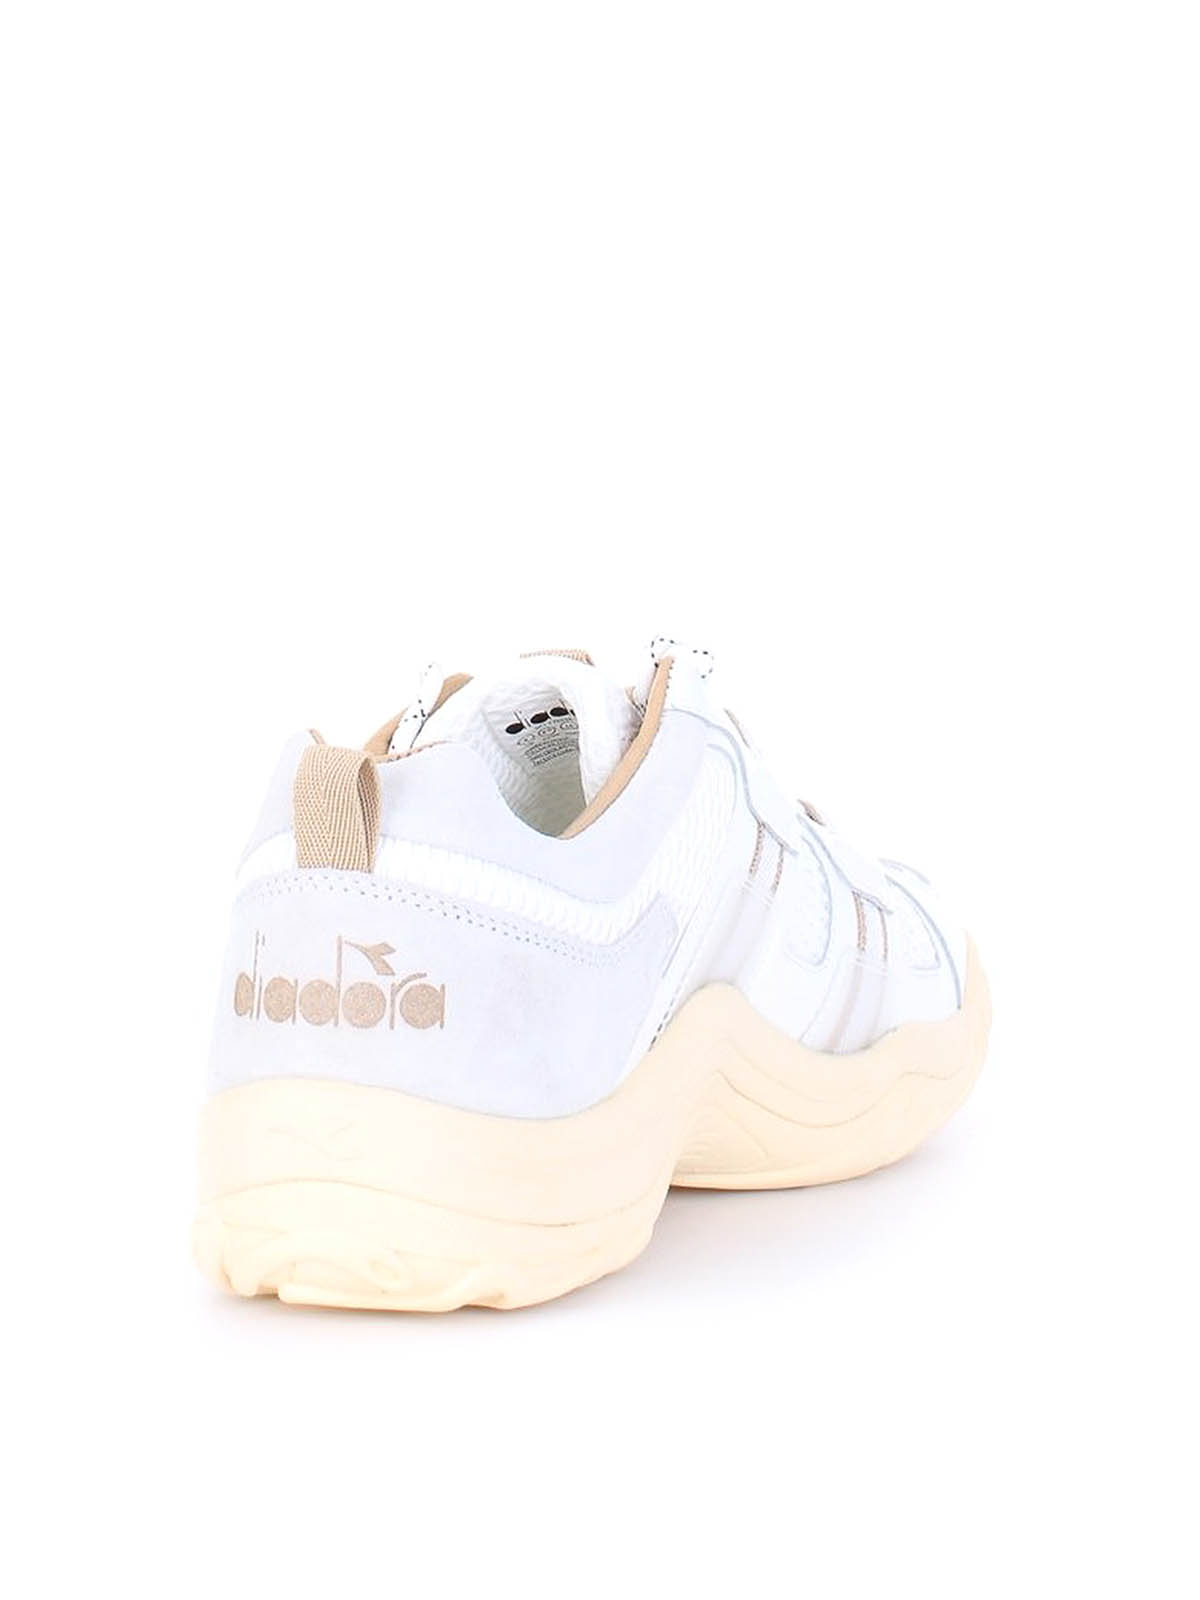 Diadora Heritage Sneakers Alpaca in pelle e mesh